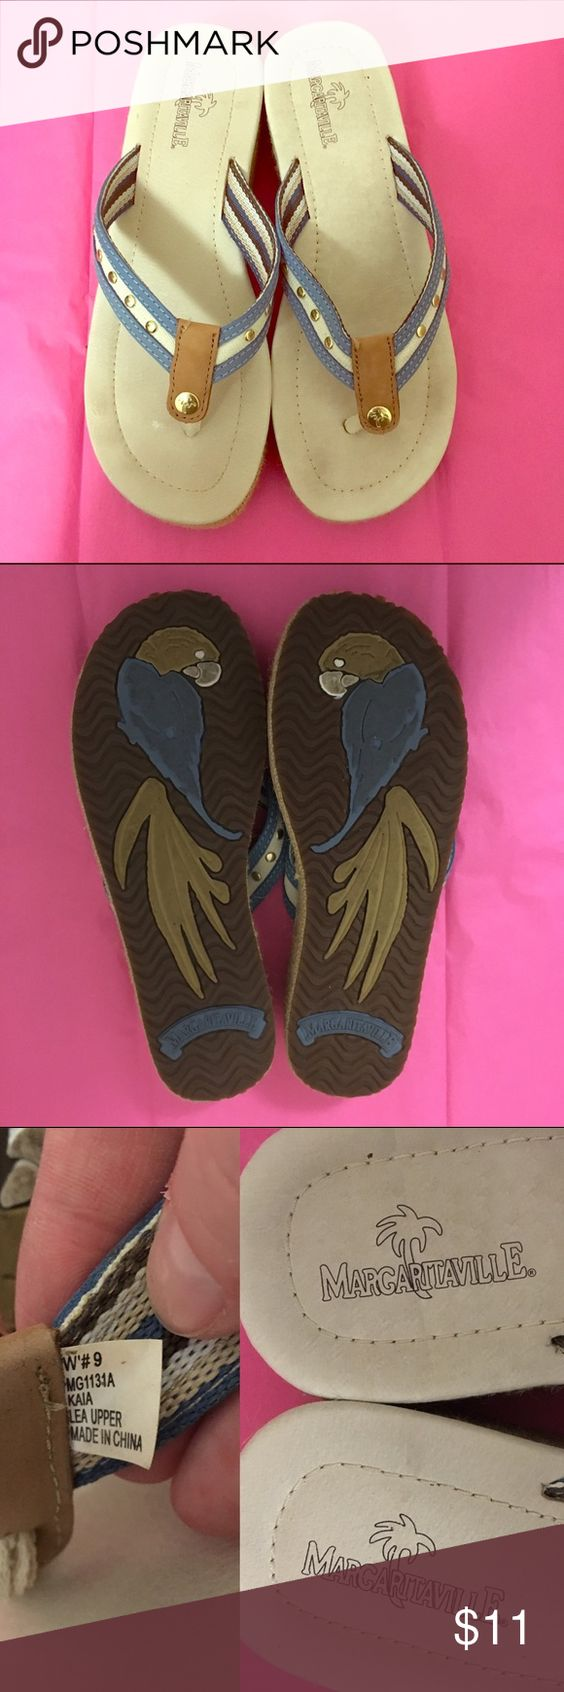 Euc 9 margaritaville flip flops Super cute! Margaritaville brand tan and blue flip flops with gold accents, Euc no flaws just some minor wear size 9 women's Margaritaville Shoes Sandals